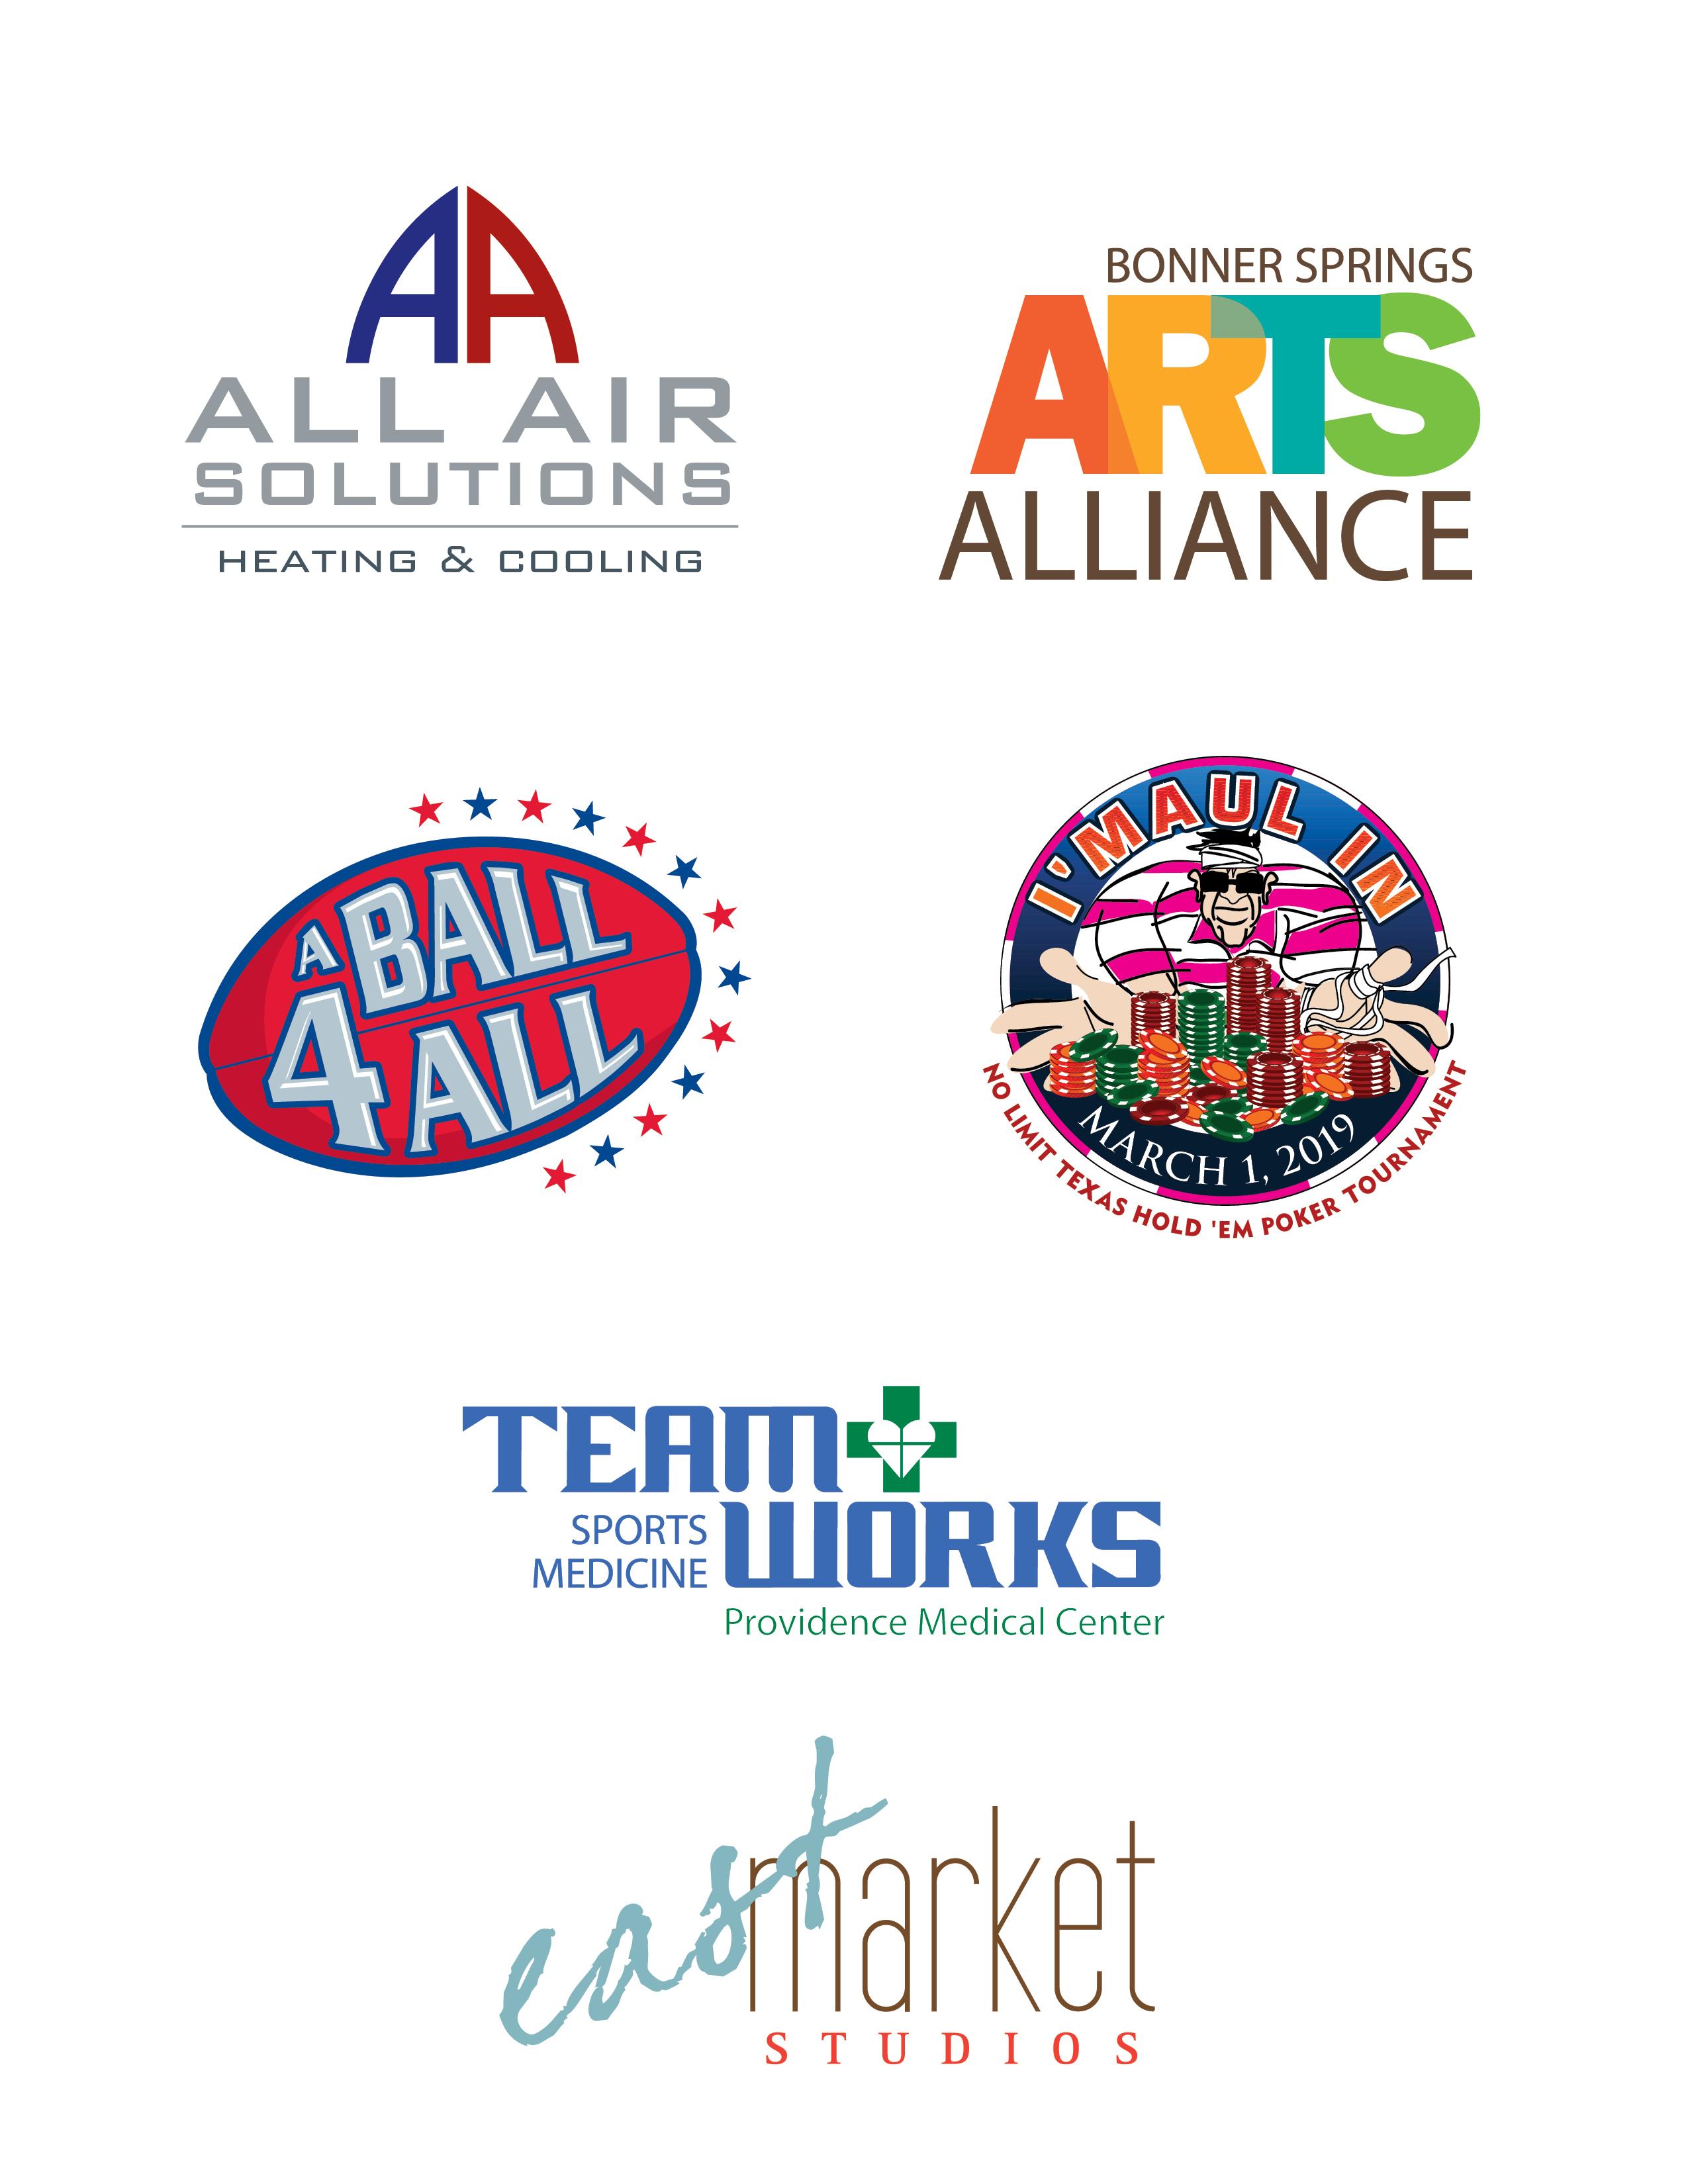 Chick Studios Logos